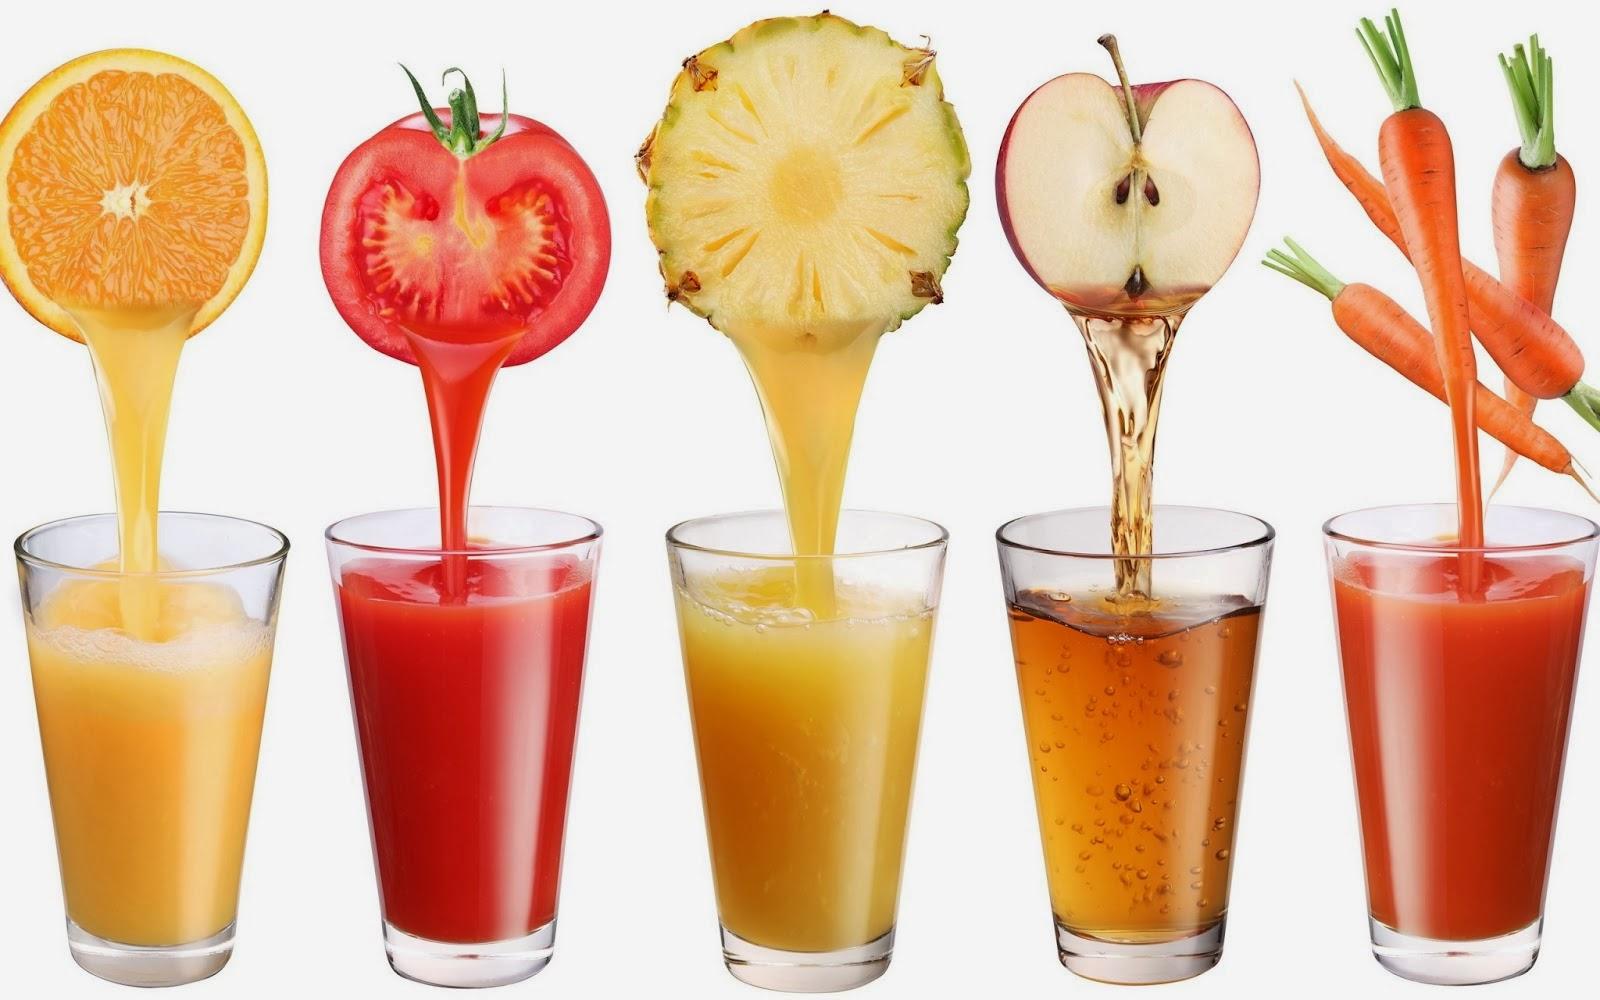 Dieta para definir sin bajar de peso image 4